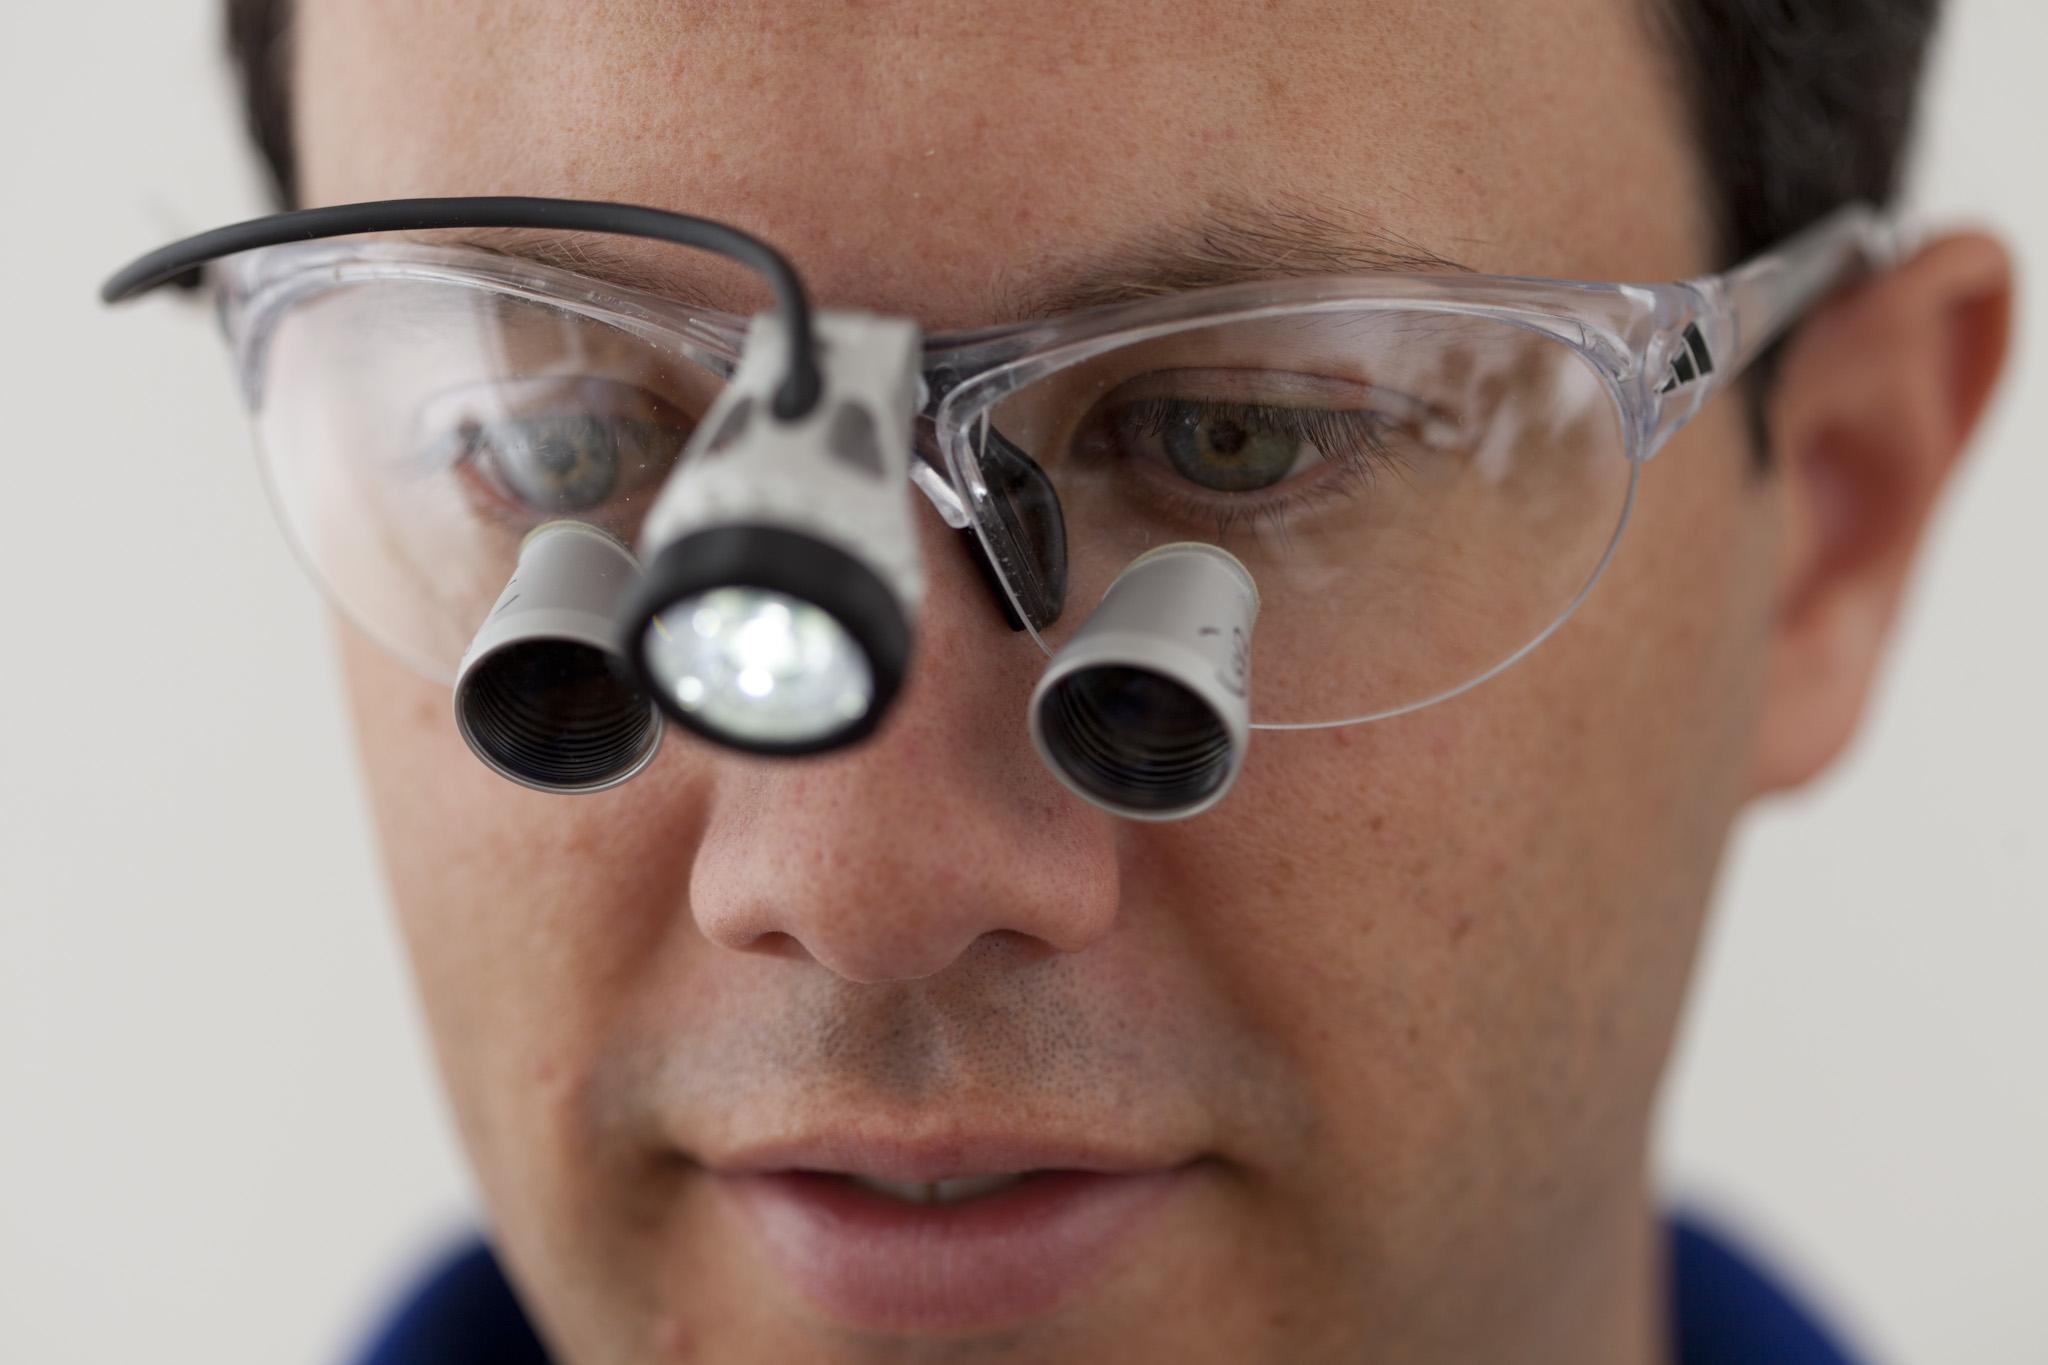 Wurzelkanalbehandlung, Endodontie, Lupenbrille, Zahnarztpraxis Dr. Ascher München